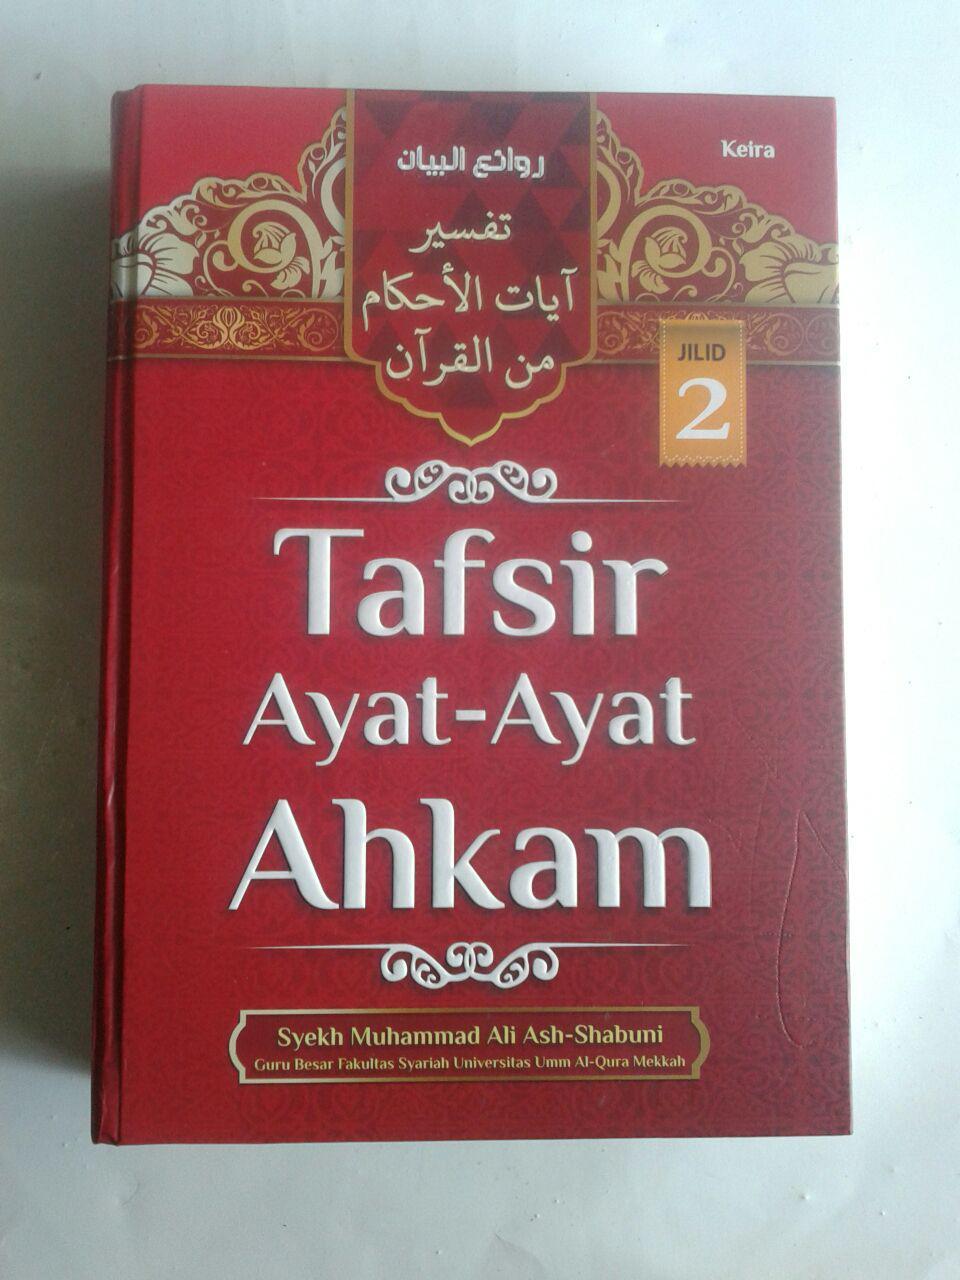 Buku Tafsir Ayat-Ayat Ahkam Jilid 2 cover 2